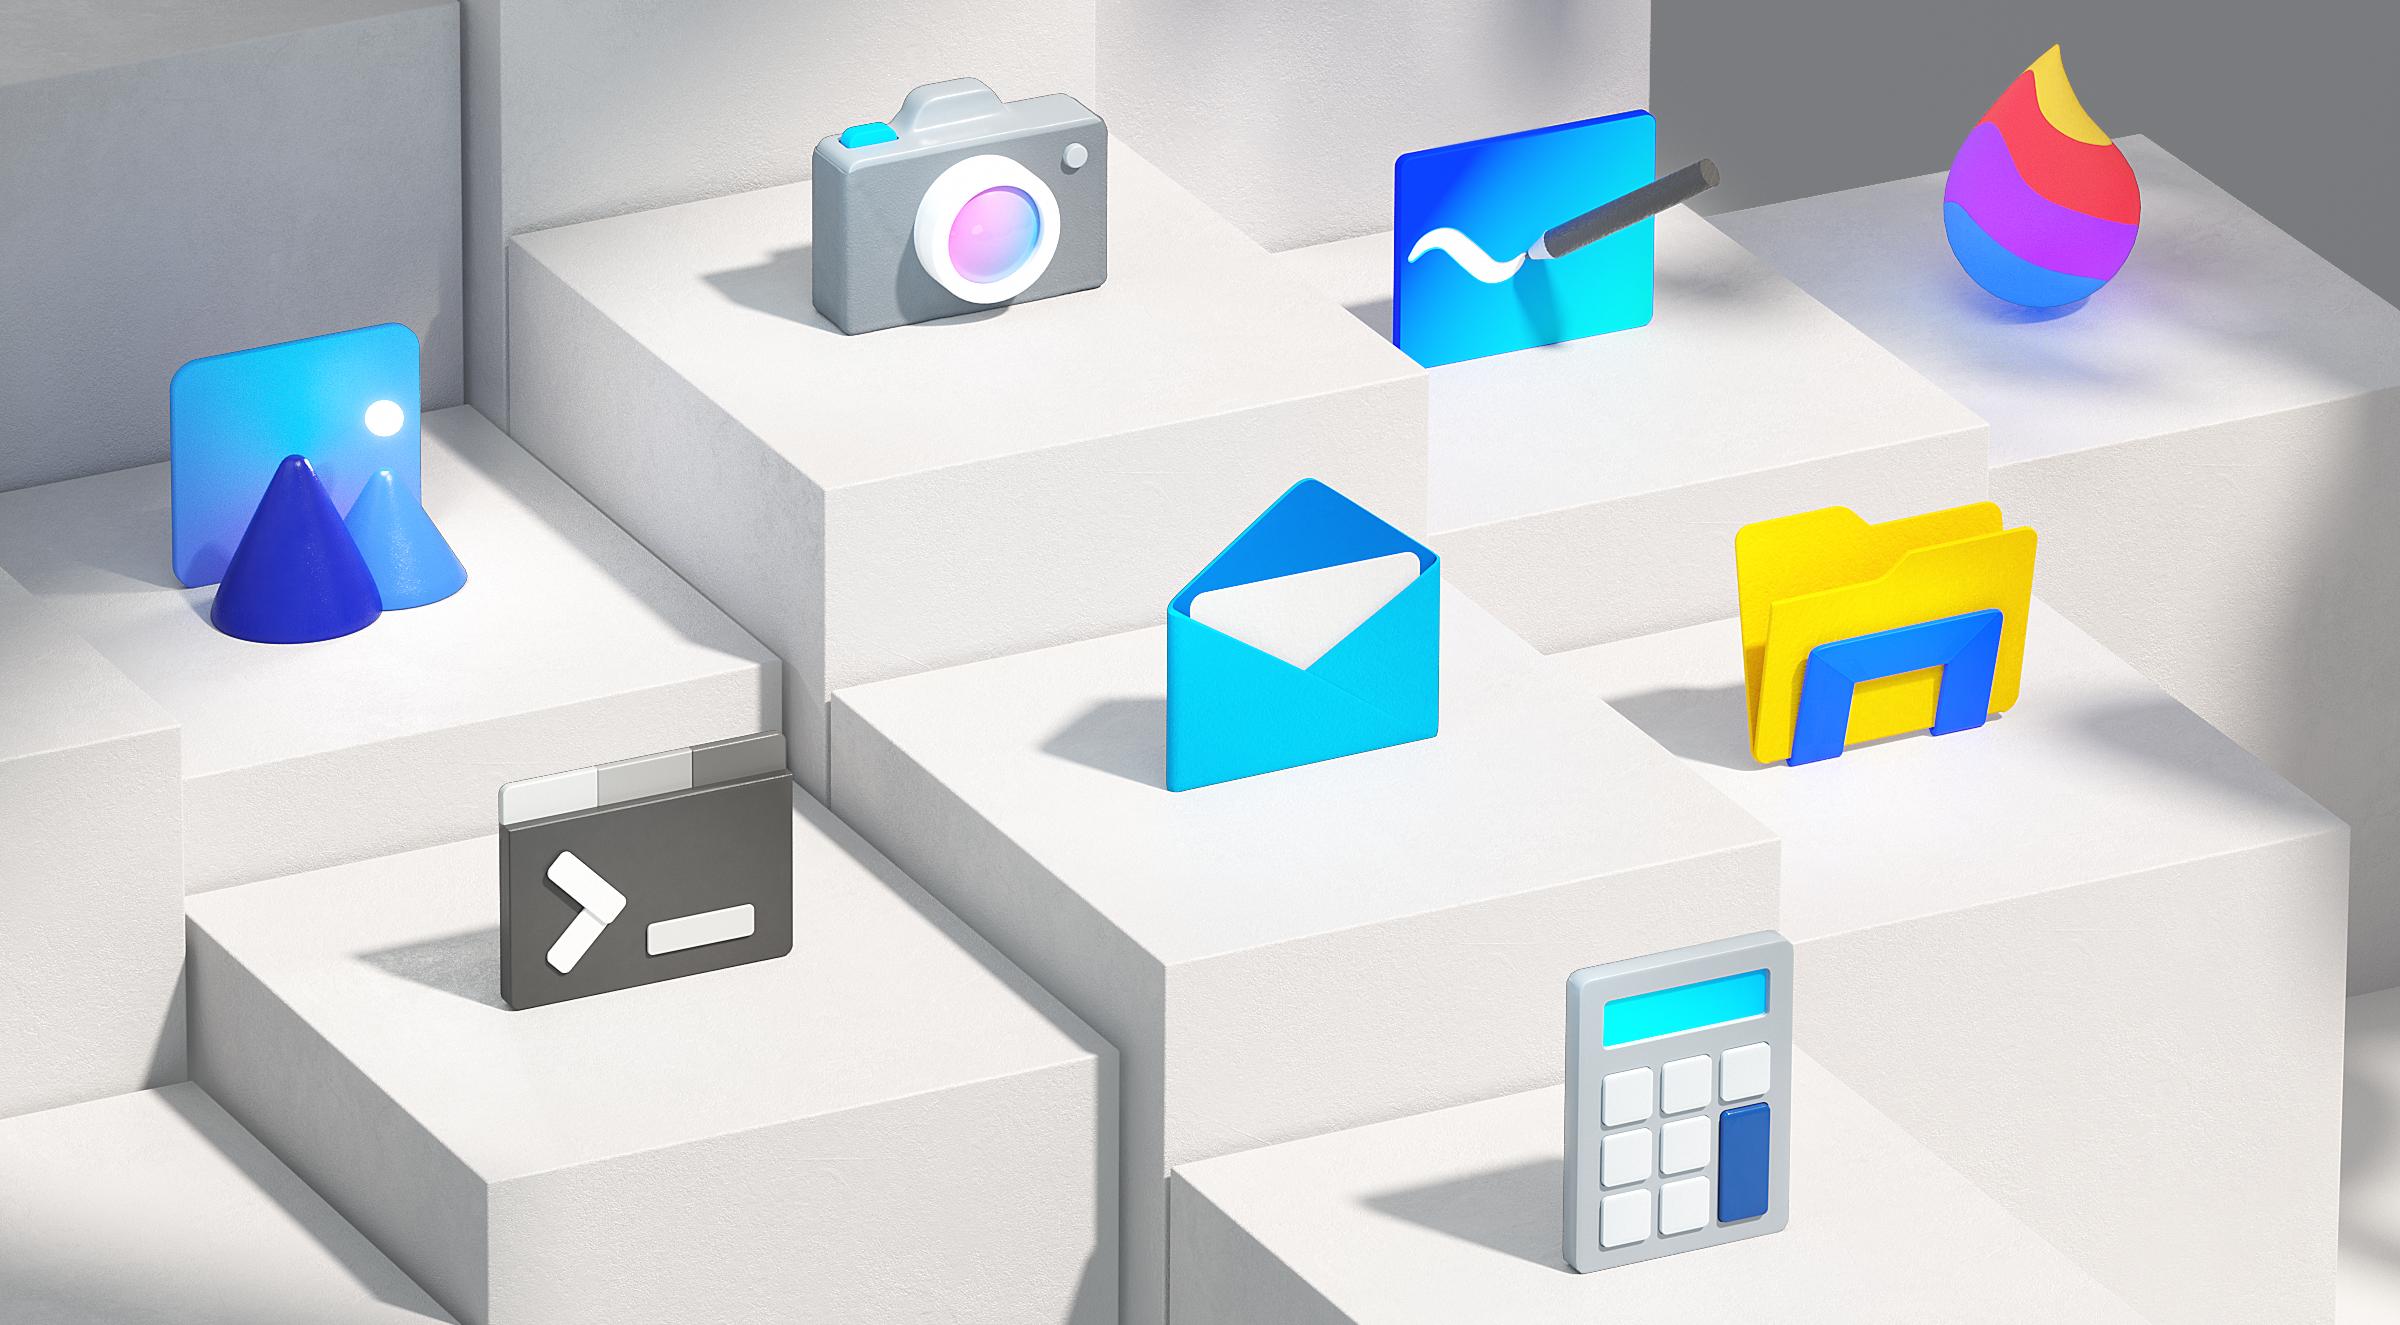 Microsoft Reveals Major Windows 10 Icon Update Based On Fluent Design